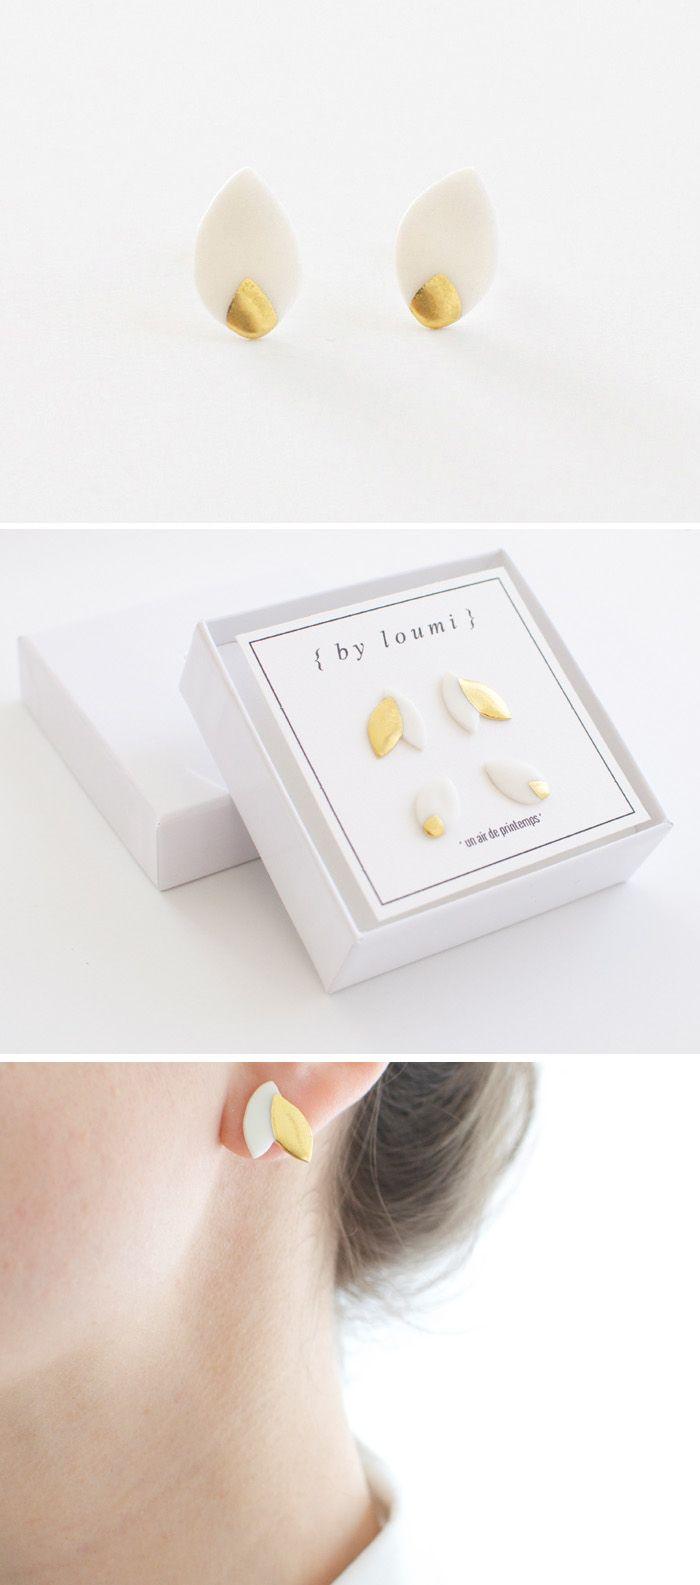 Minimalist porcelain stud earrings - white & gold { by loumi }